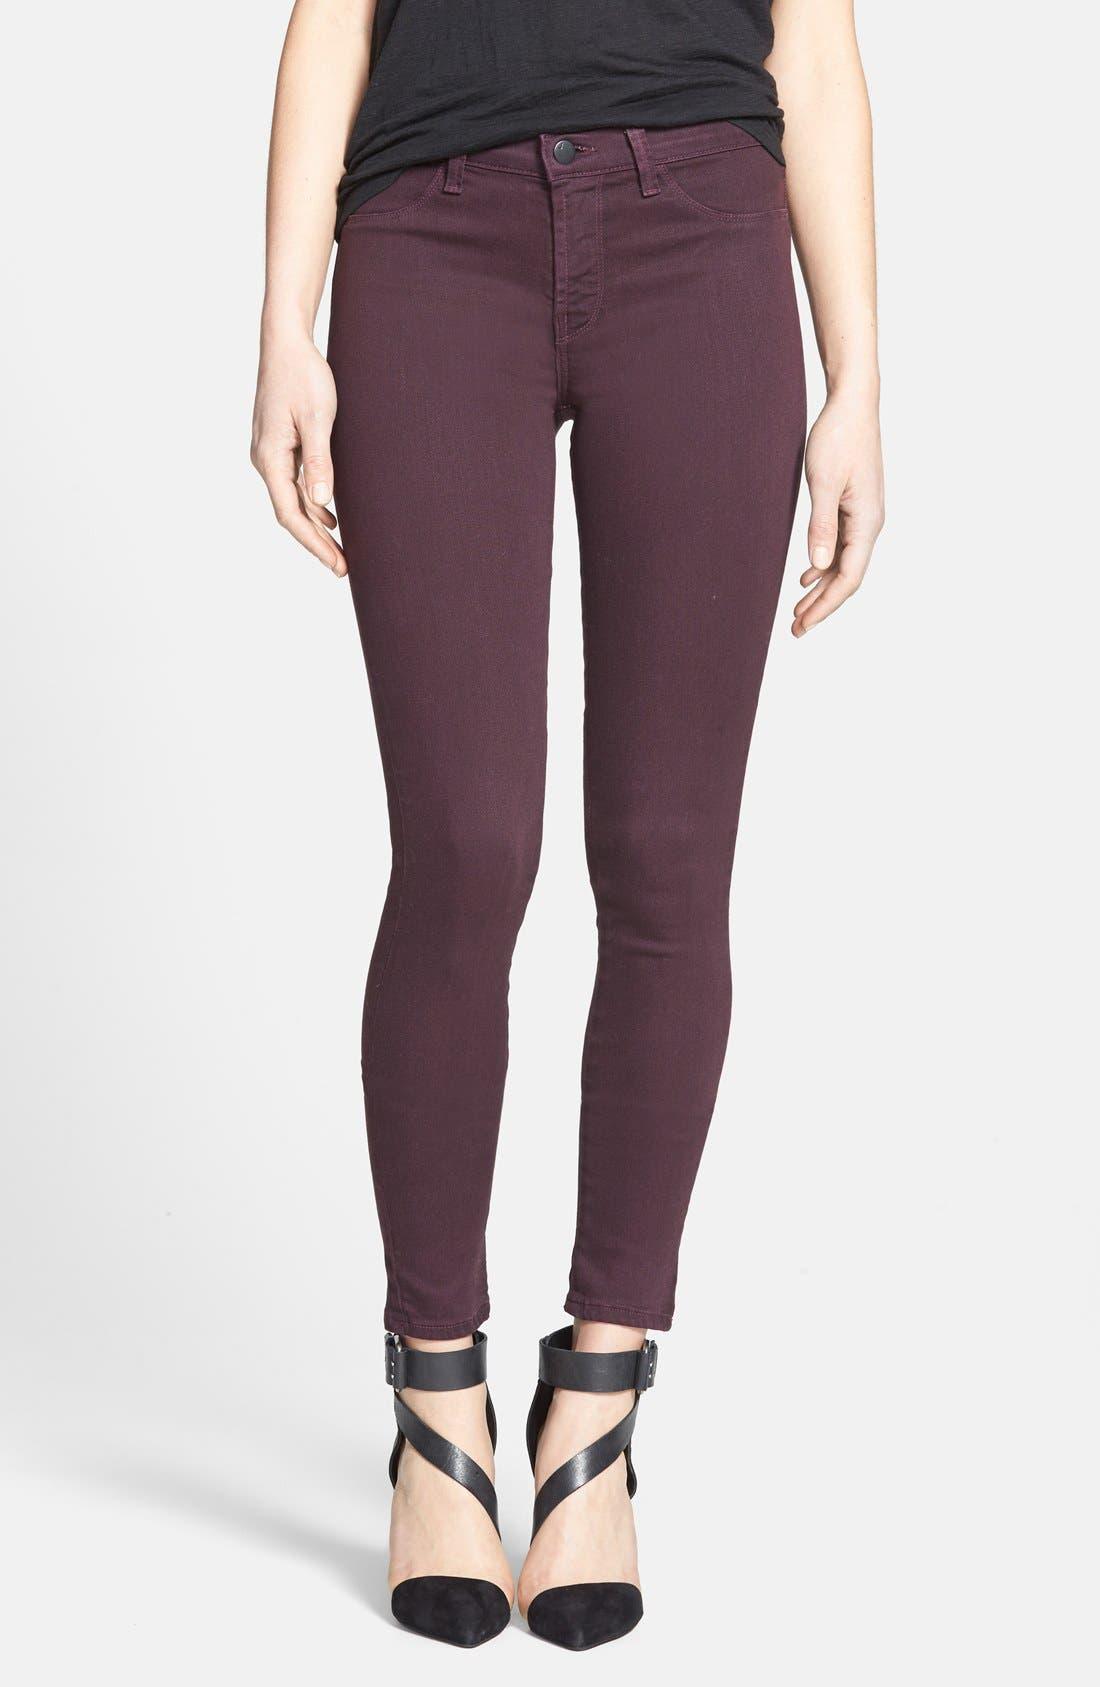 Alternate Image 1 Selected - J Brand '485' Skinny Jeans (Dark Plum)